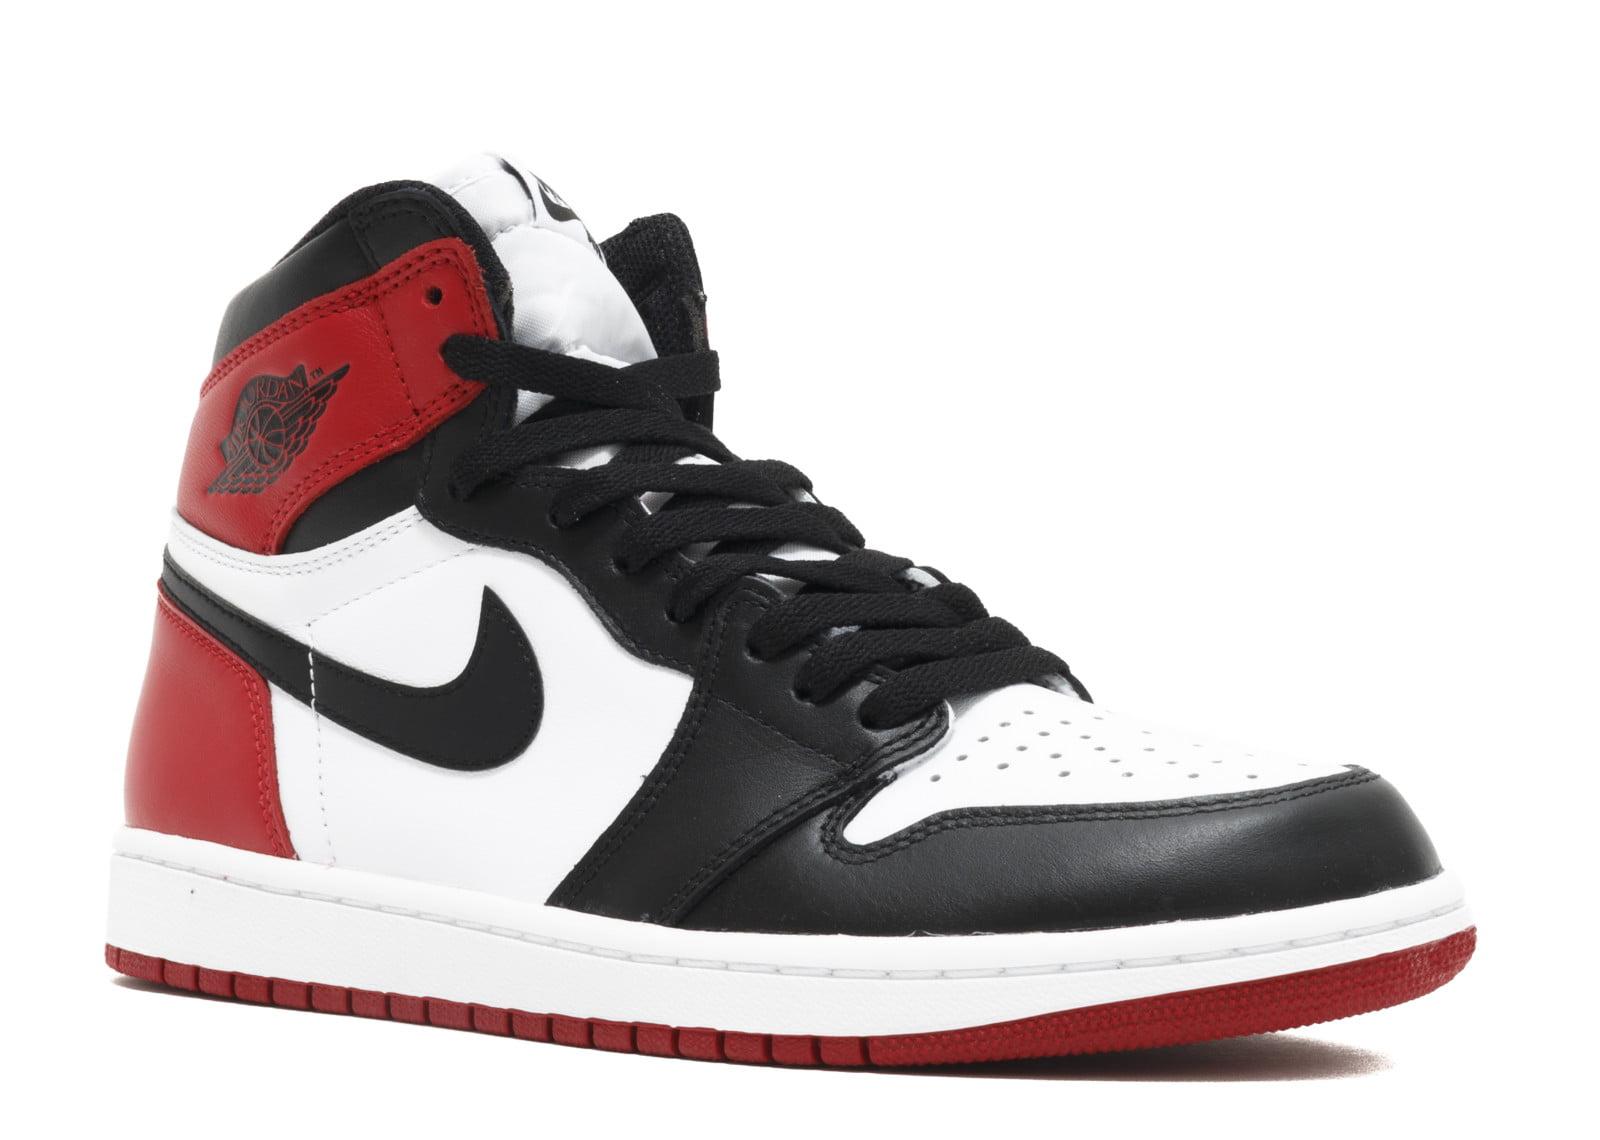 Air Jordan 1 Retro High Og 'Black Toe